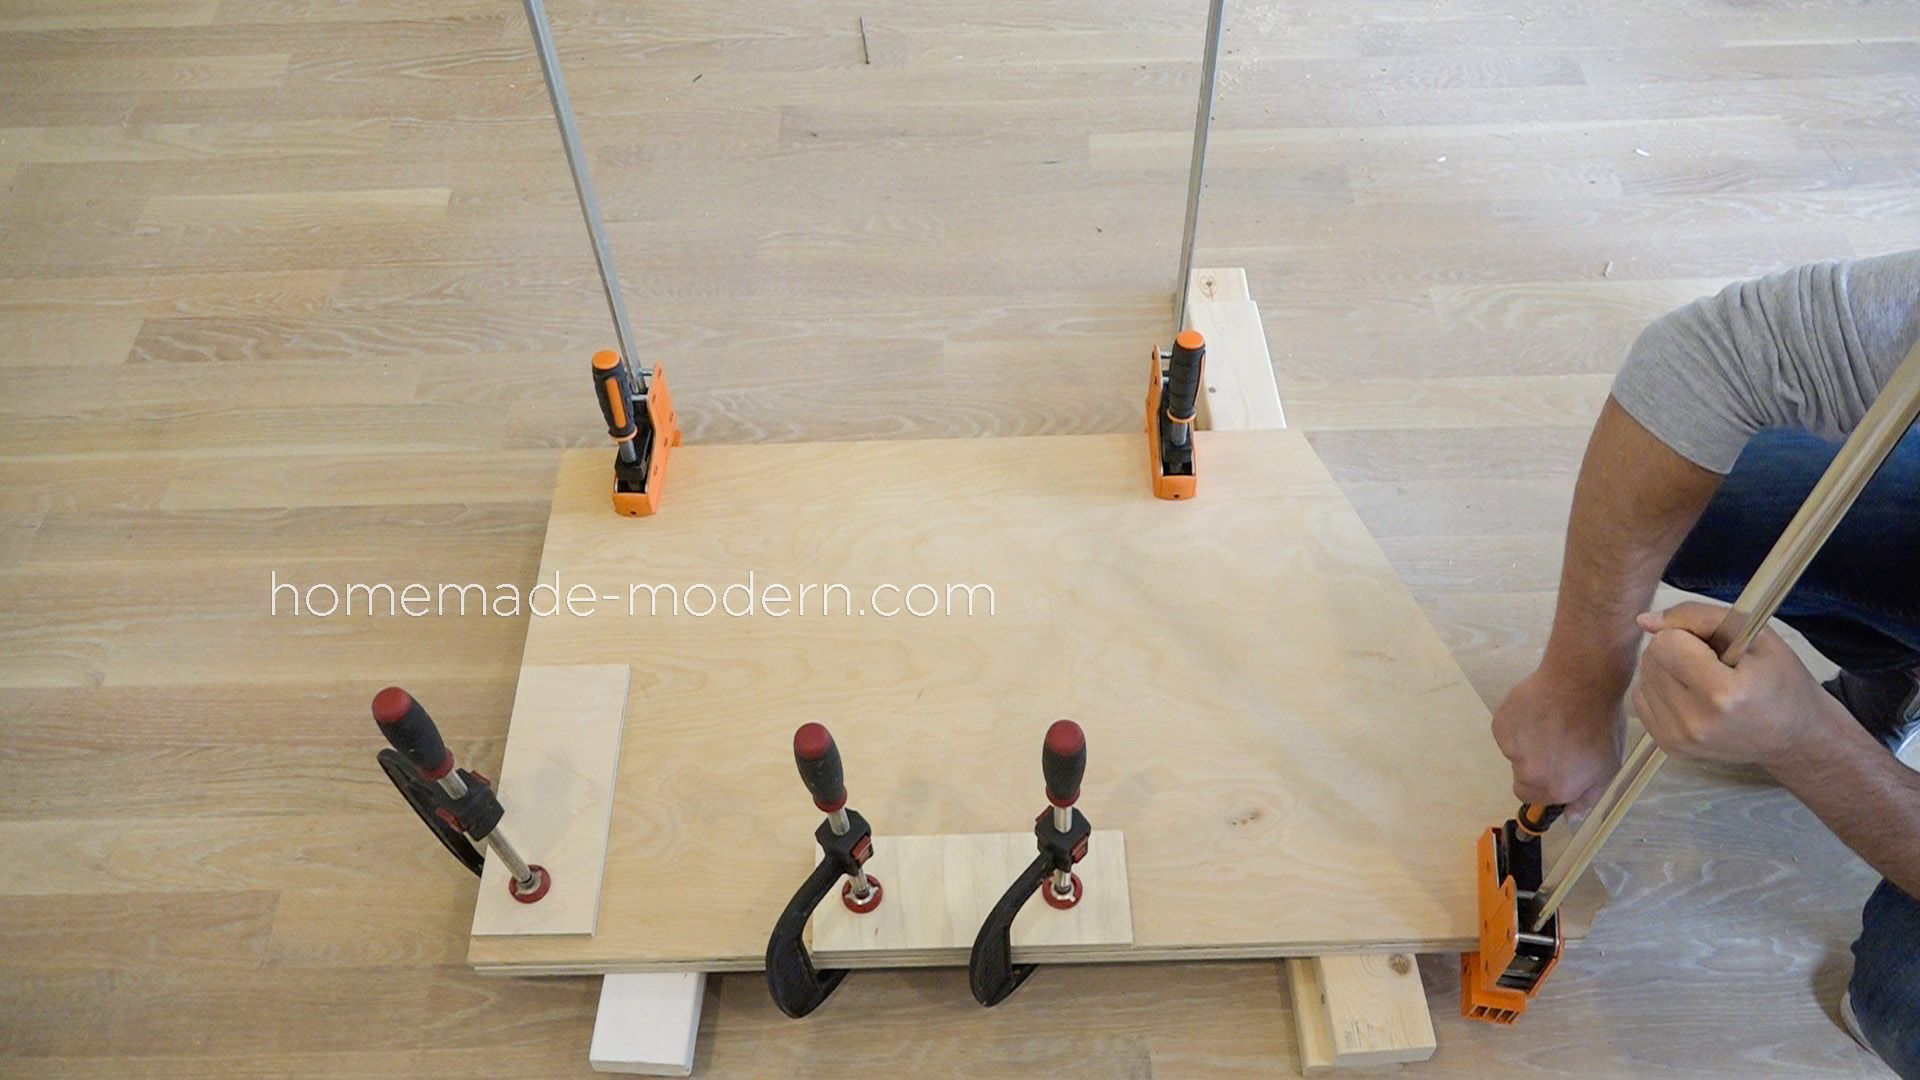 Best Homemade Modern Diy Ep99 Diy Cnc Spiral Staircase Diy 400 x 300